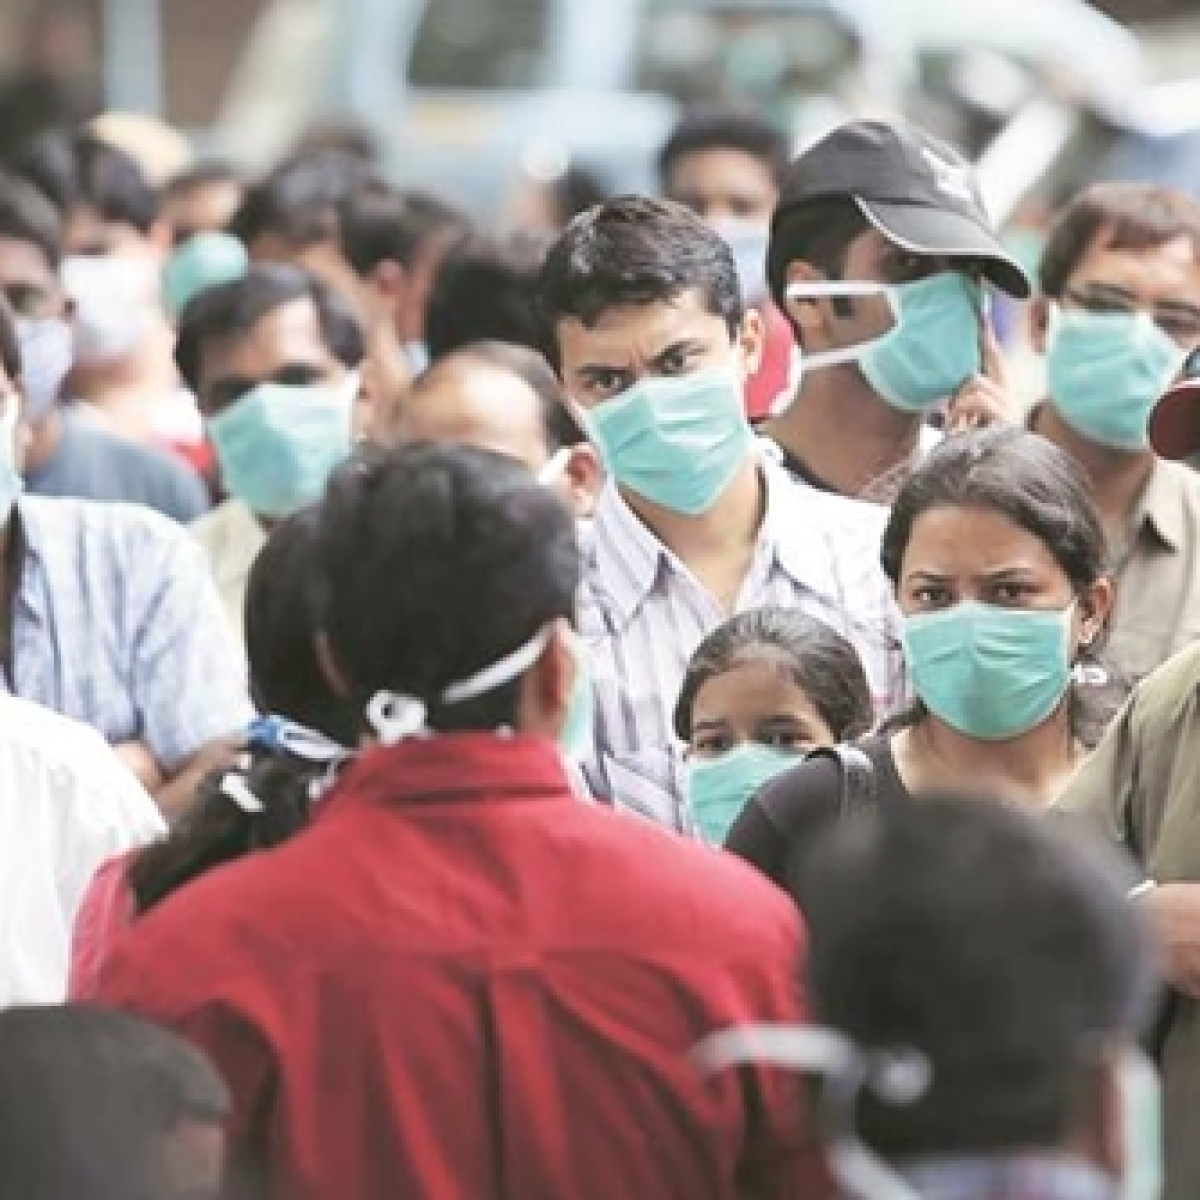 FPJ Edit: A public health hazard